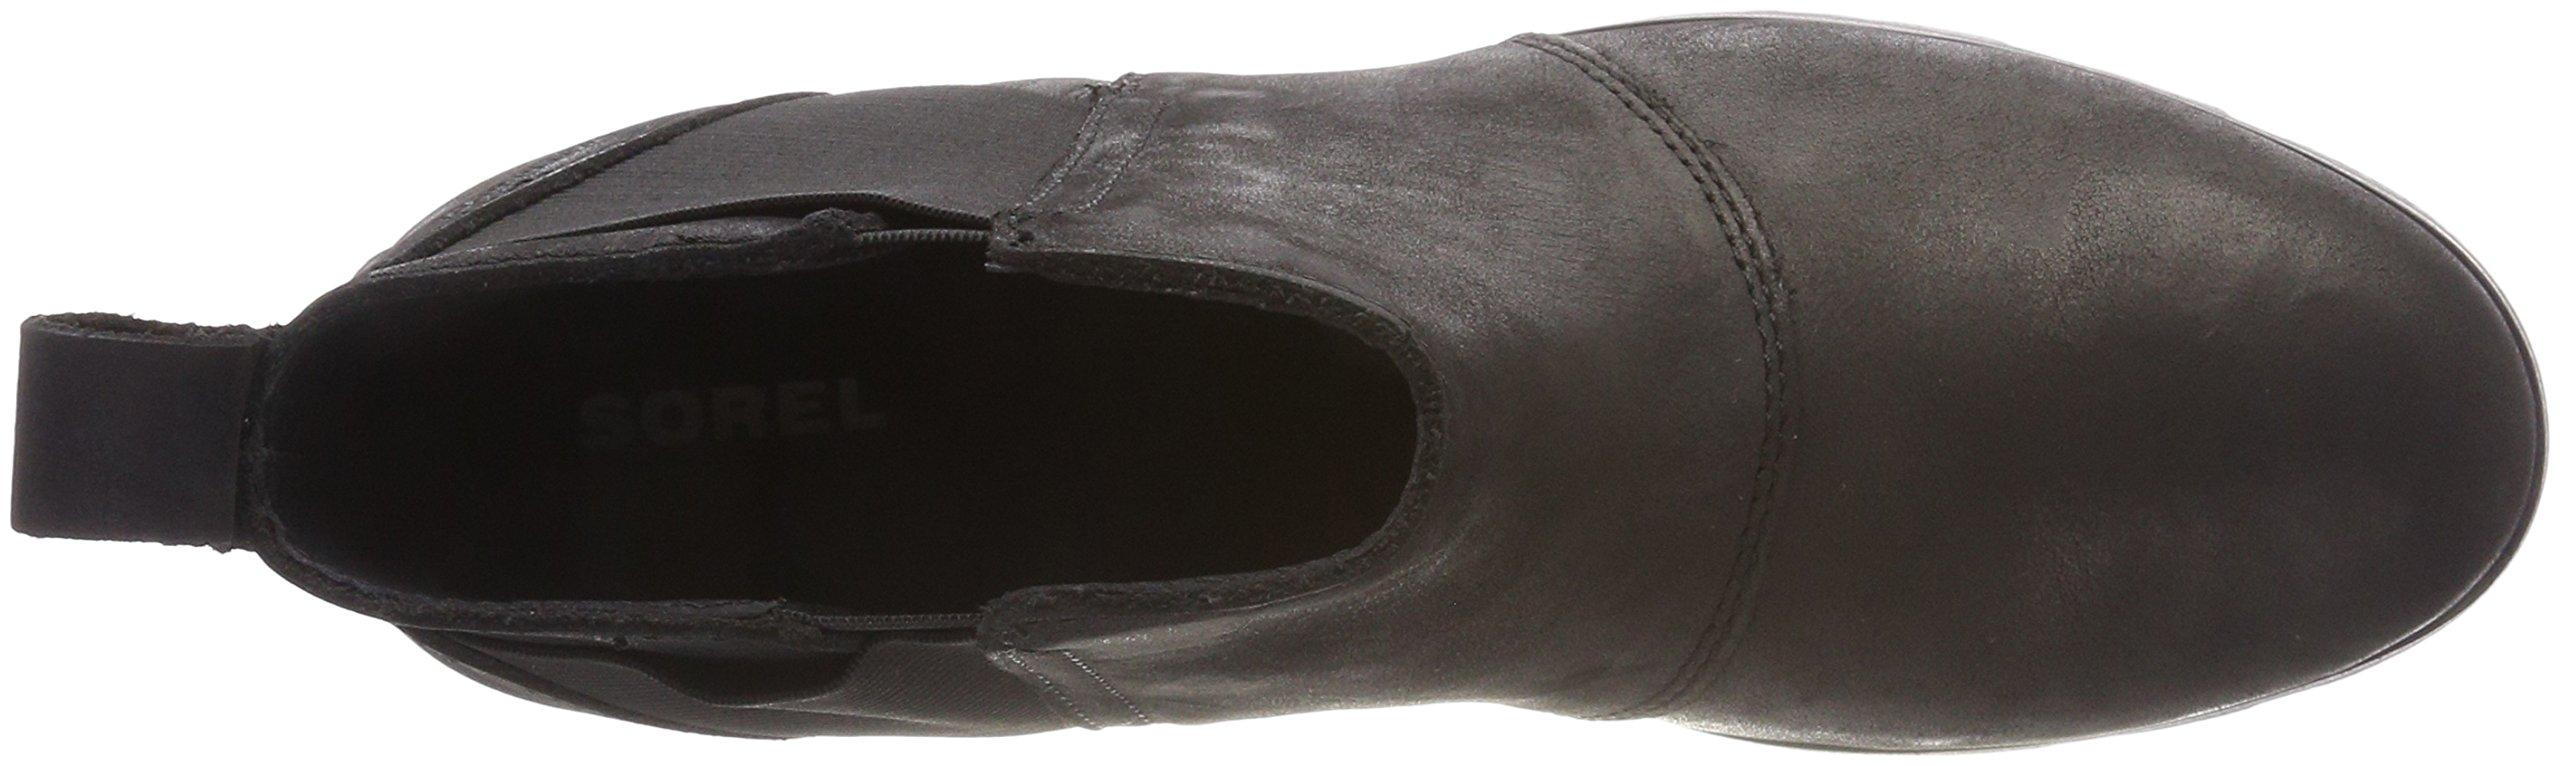 Sorel Womens Emelie Chelsea Black Boot - 8 by SOREL (Image #7)